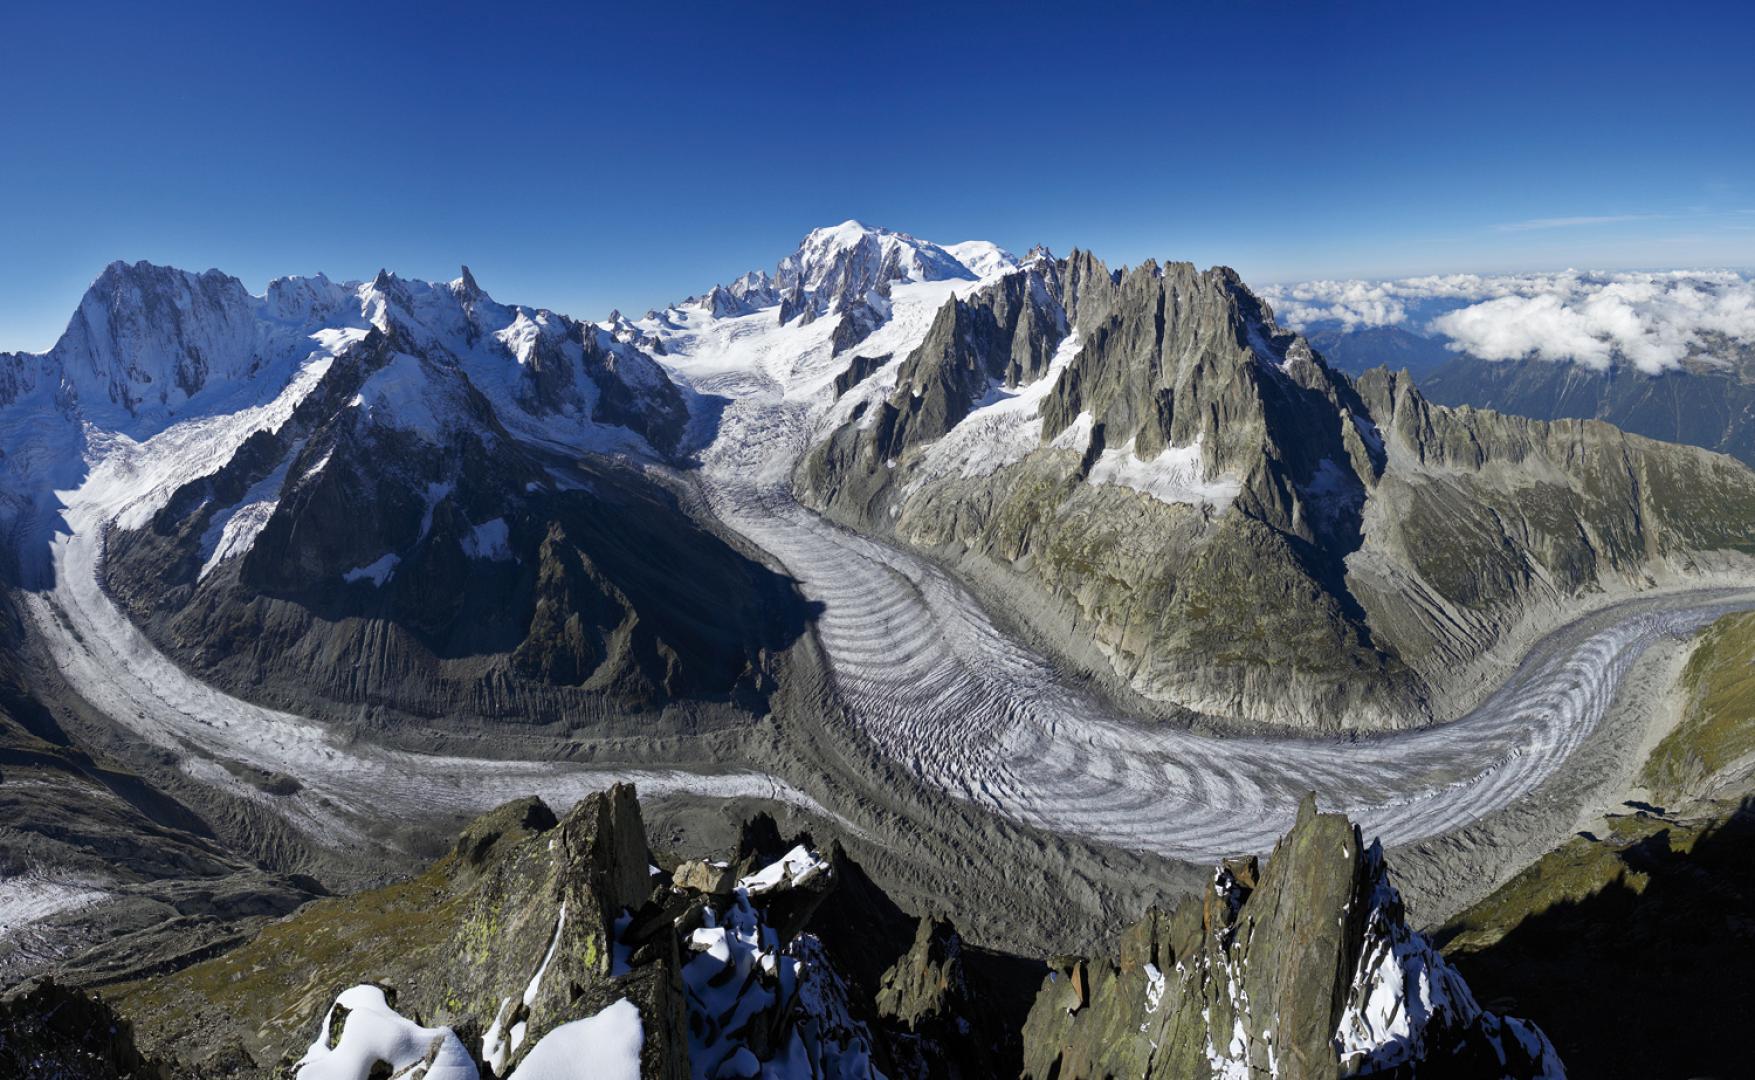 Mer_de_glace_Chamonix.jpeg